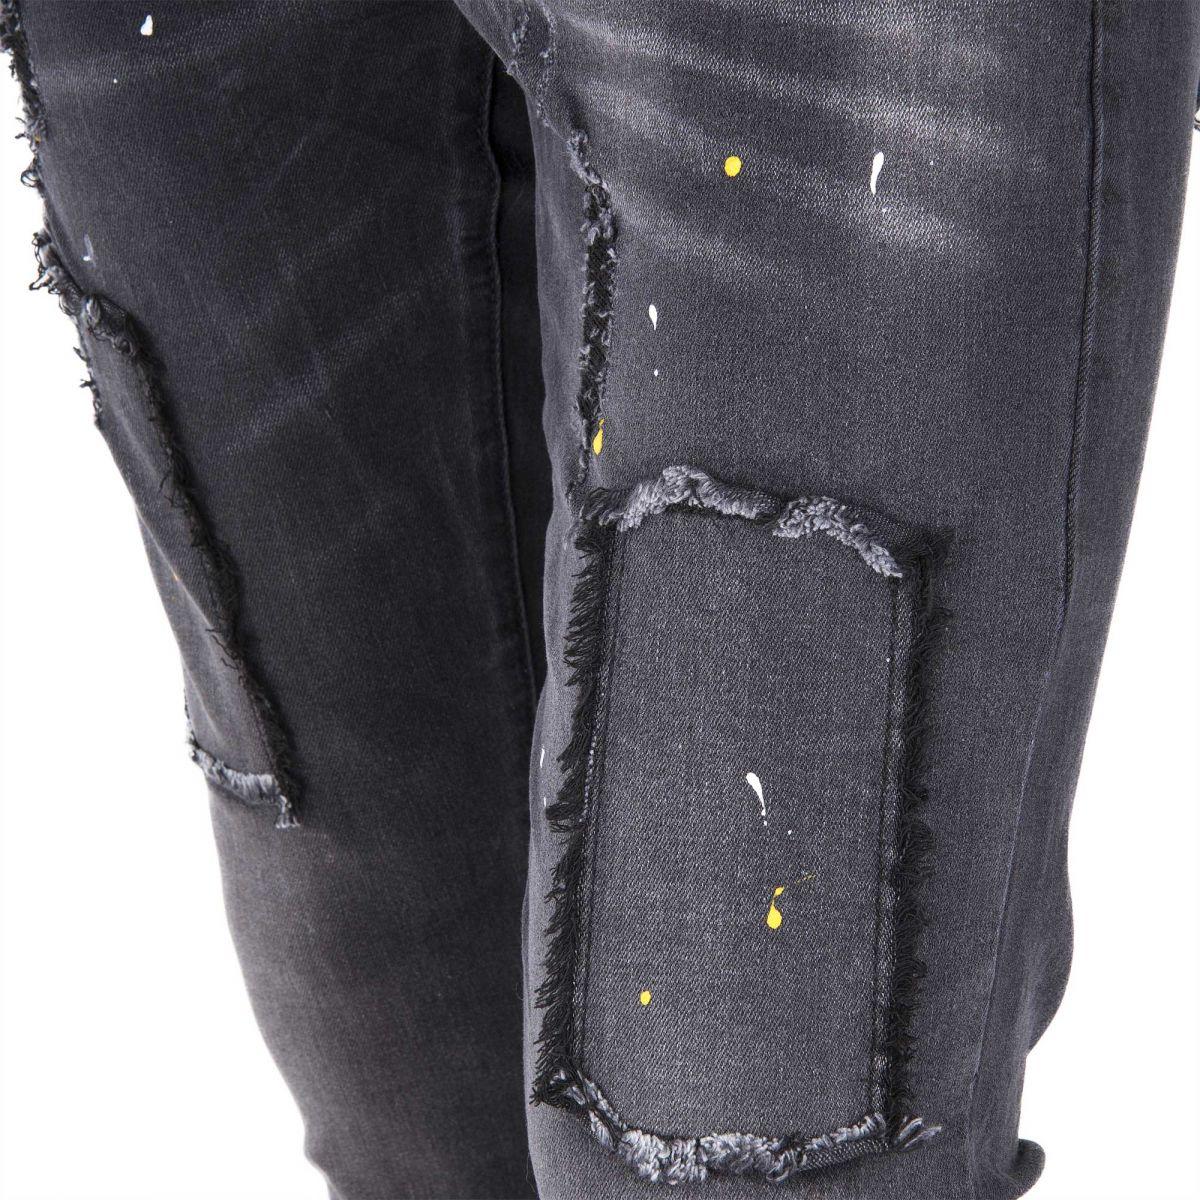 jean skinny stretch noir empi cements d chiri s homme blue. Black Bedroom Furniture Sets. Home Design Ideas